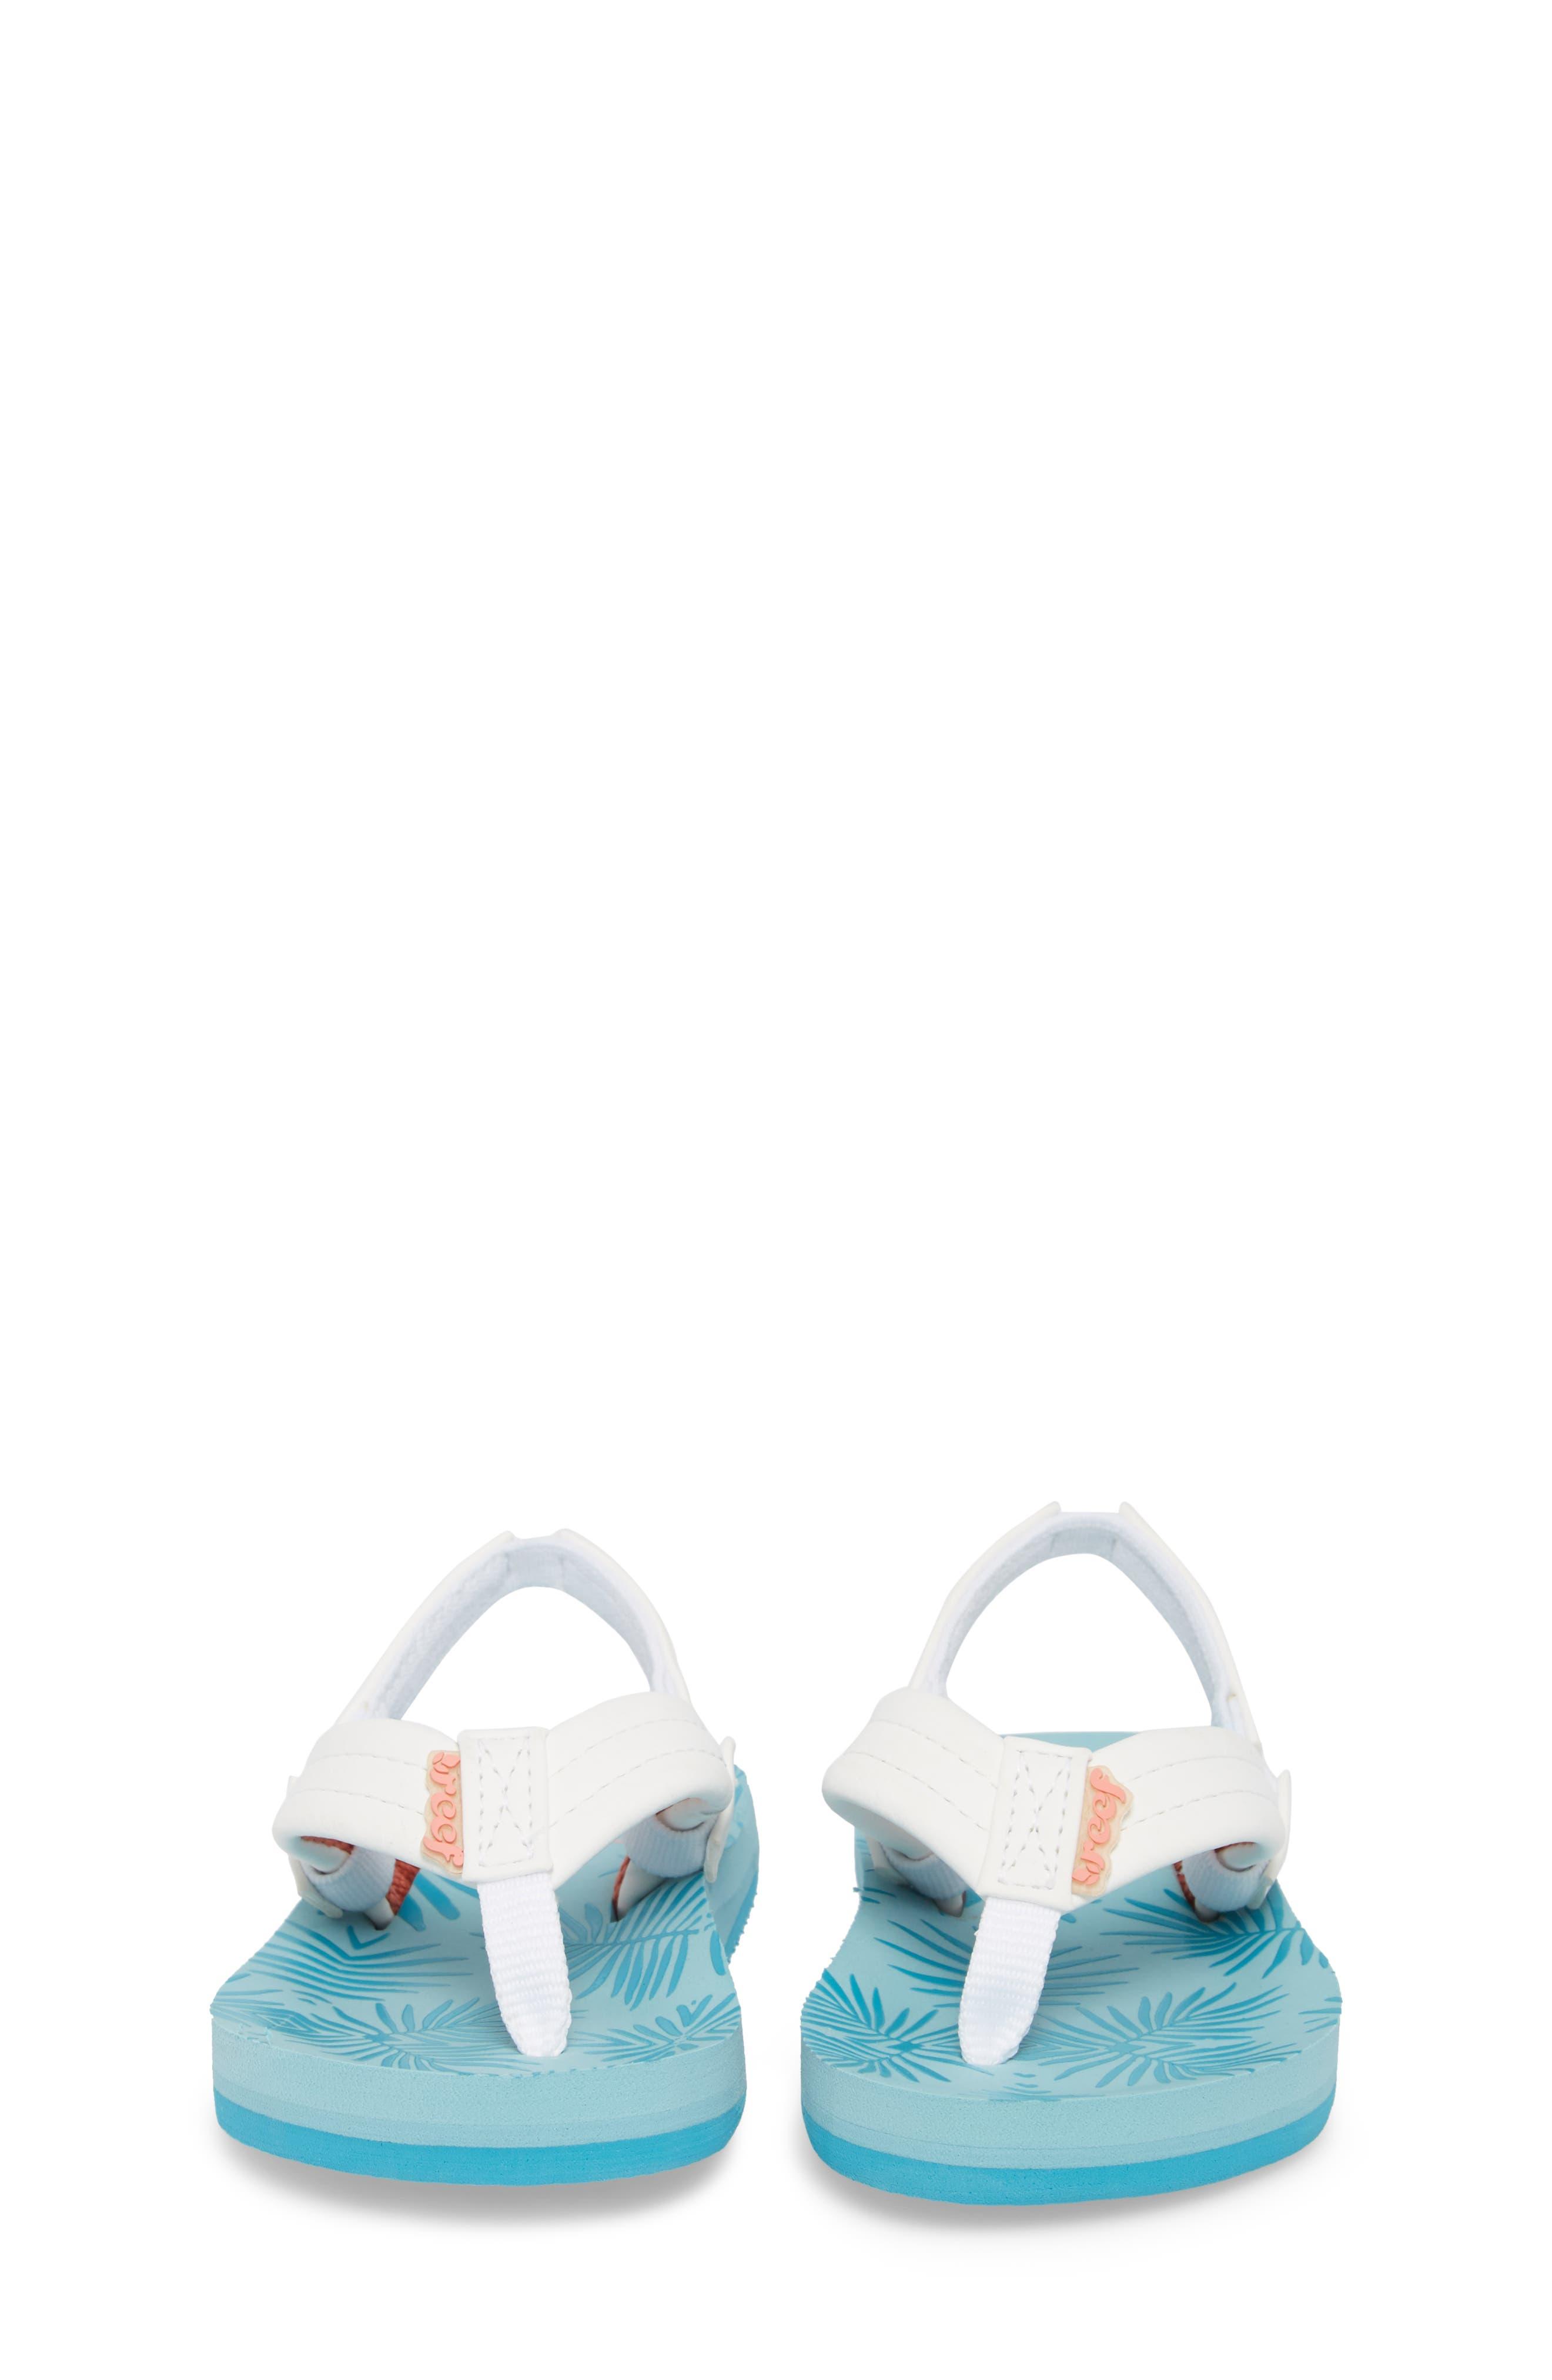 Little Reef Footprints Sandal,                             Alternate thumbnail 5, color,                             403